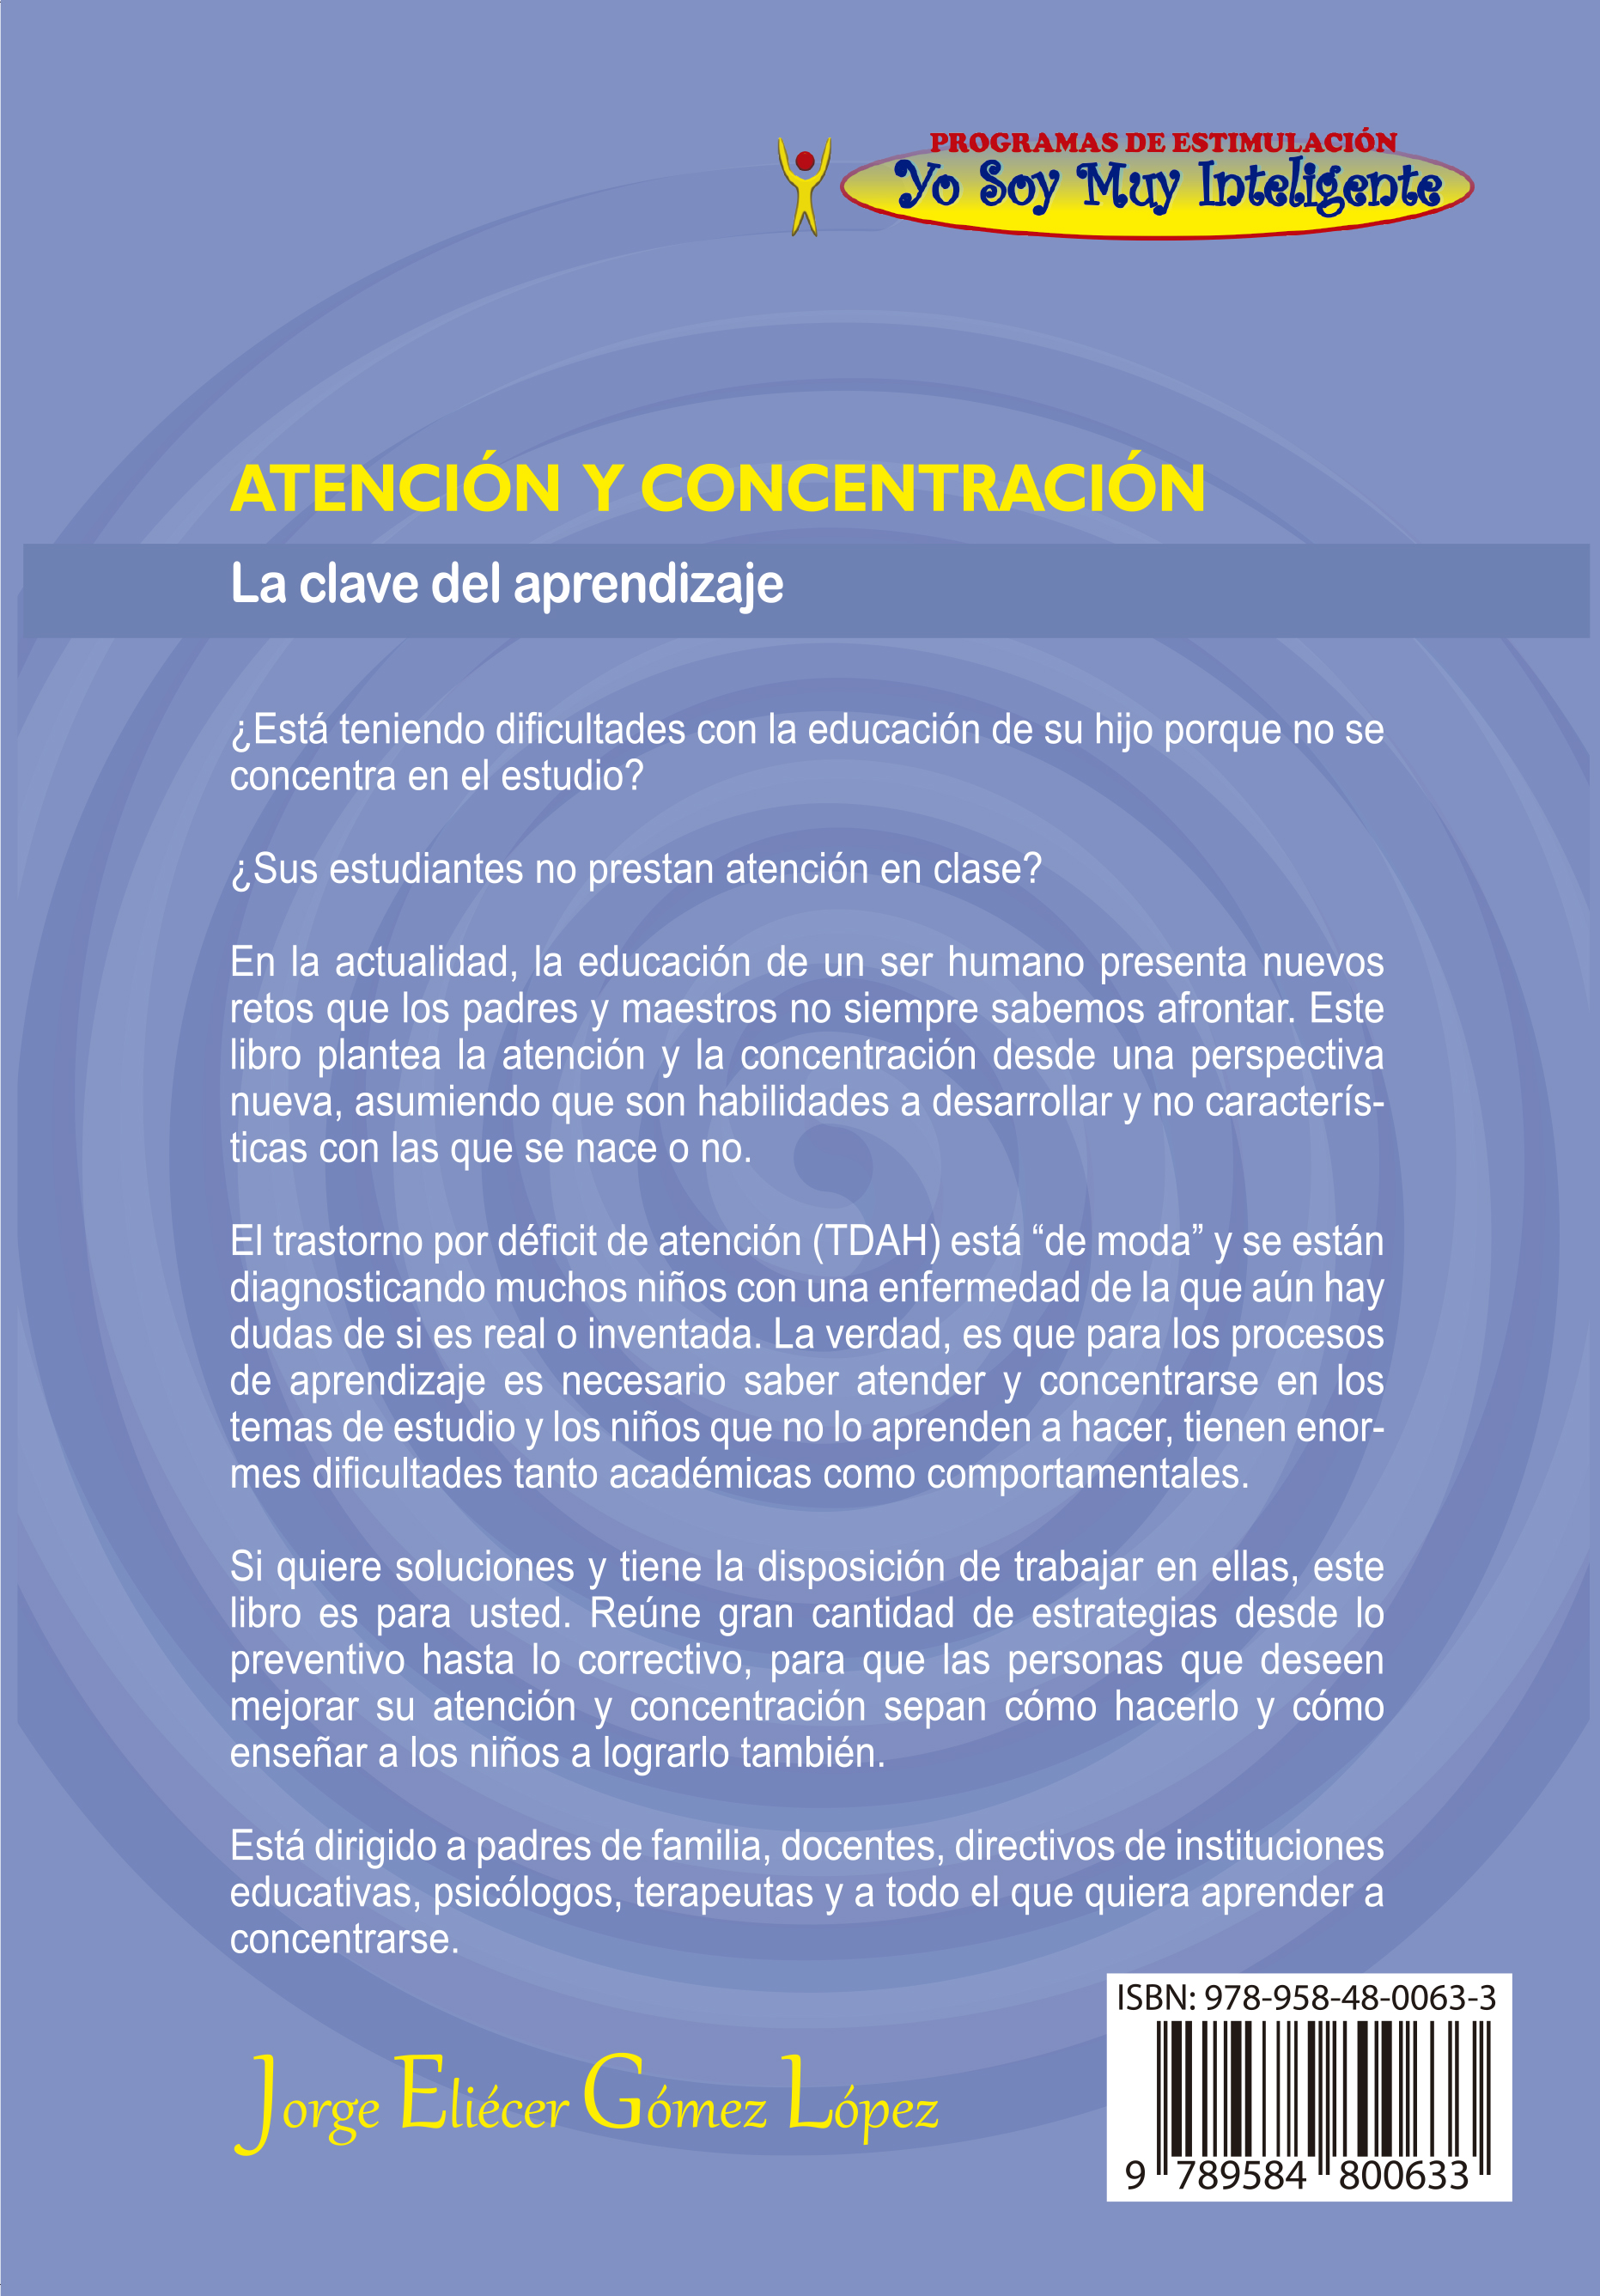 DÉFICIT DE ATENCIÓN - ATENCIÓN DISPERSA